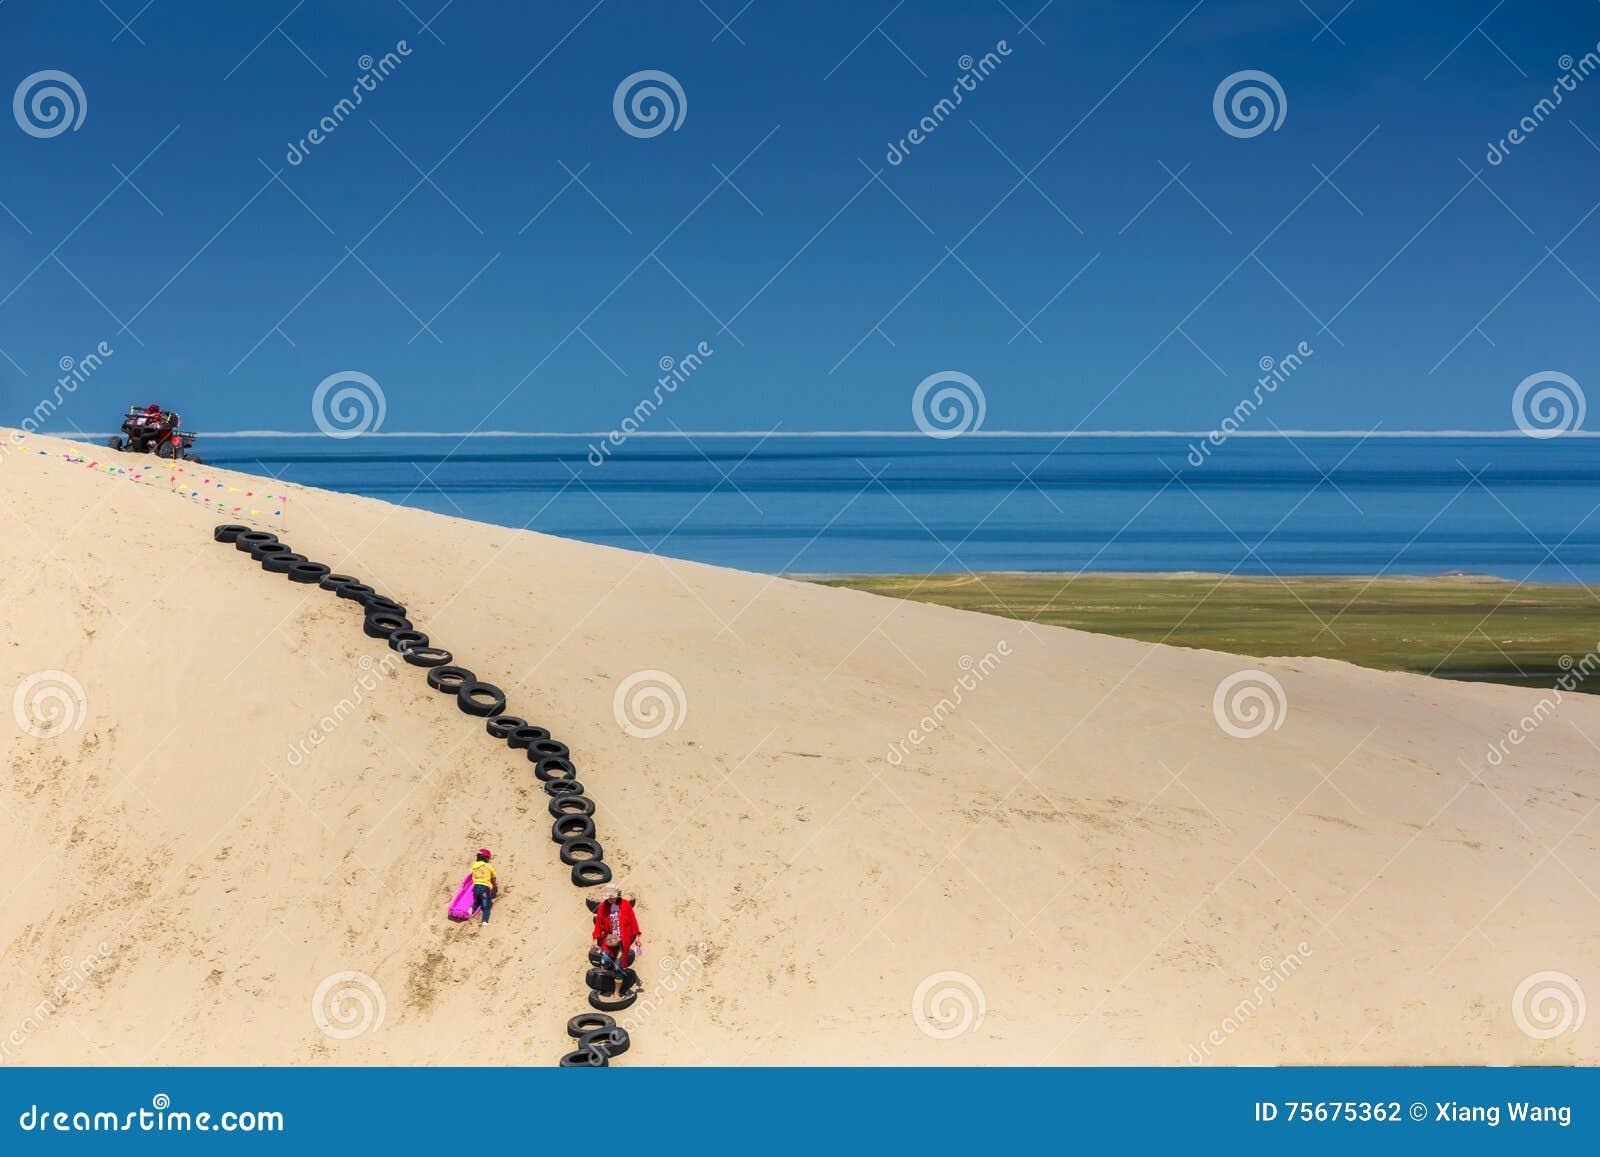 Holiday beach play